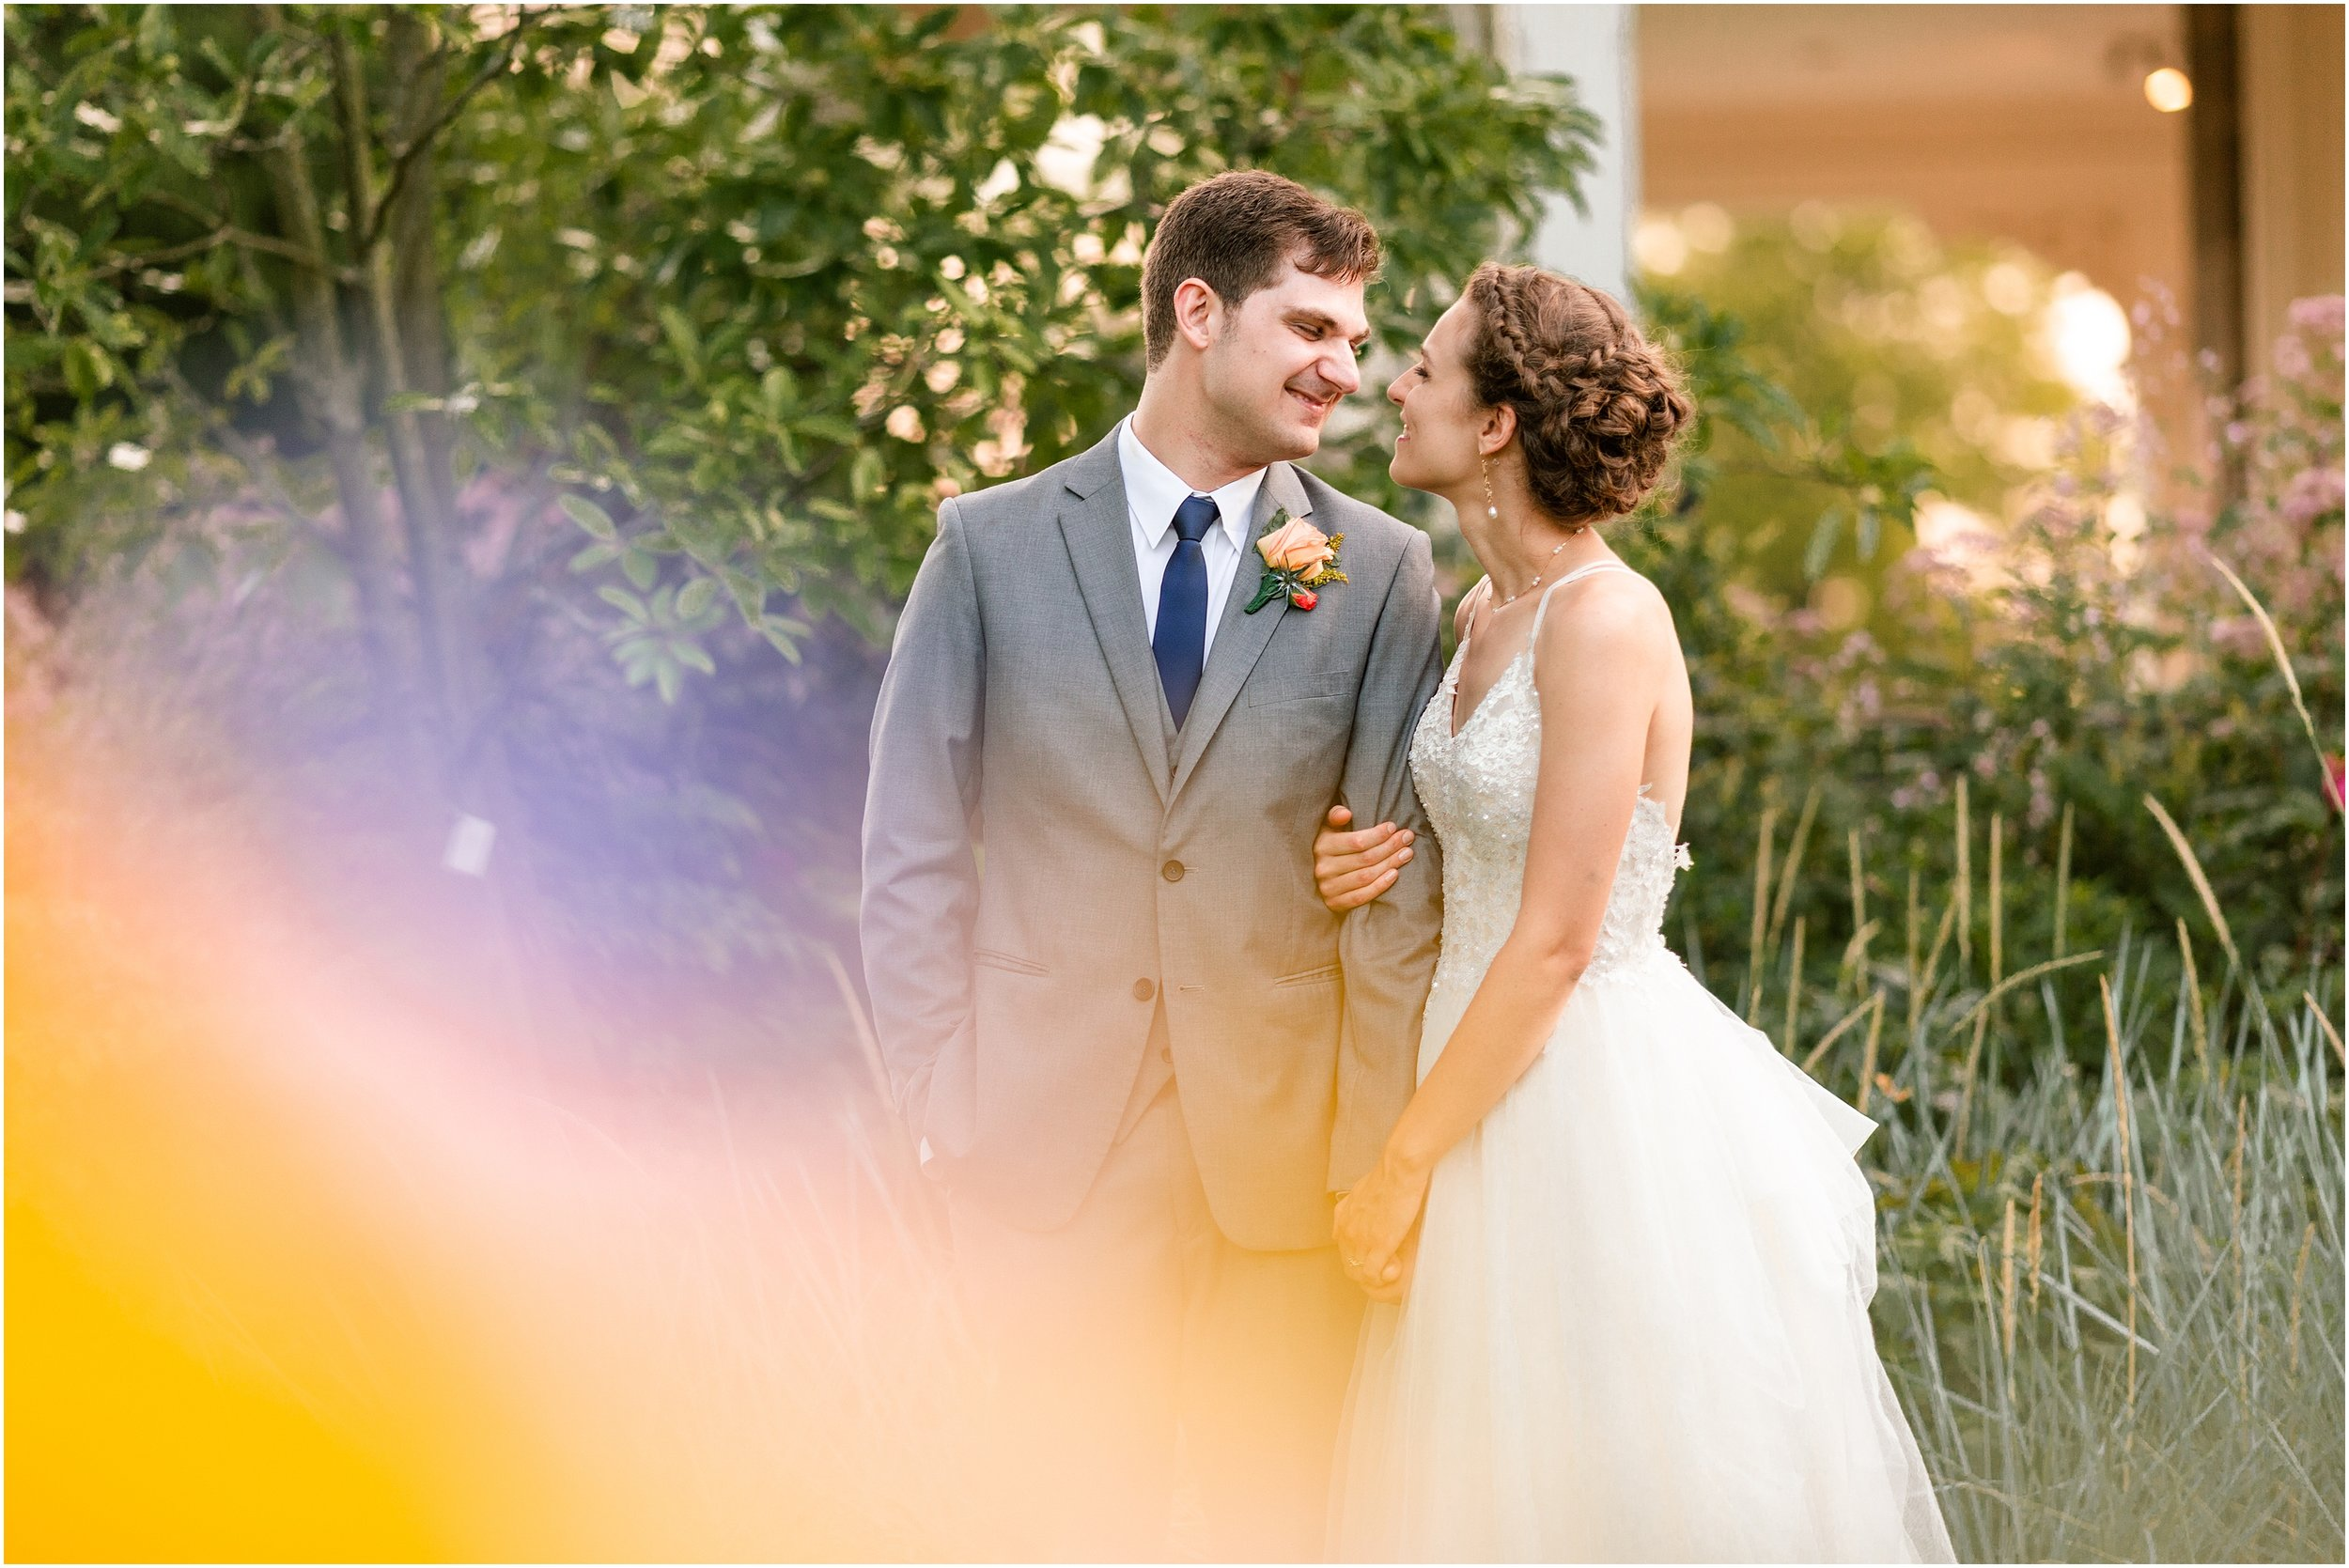 hannah leigh photography Cylburn Arboretum Wedding Baltimore, MD_3464.jpg